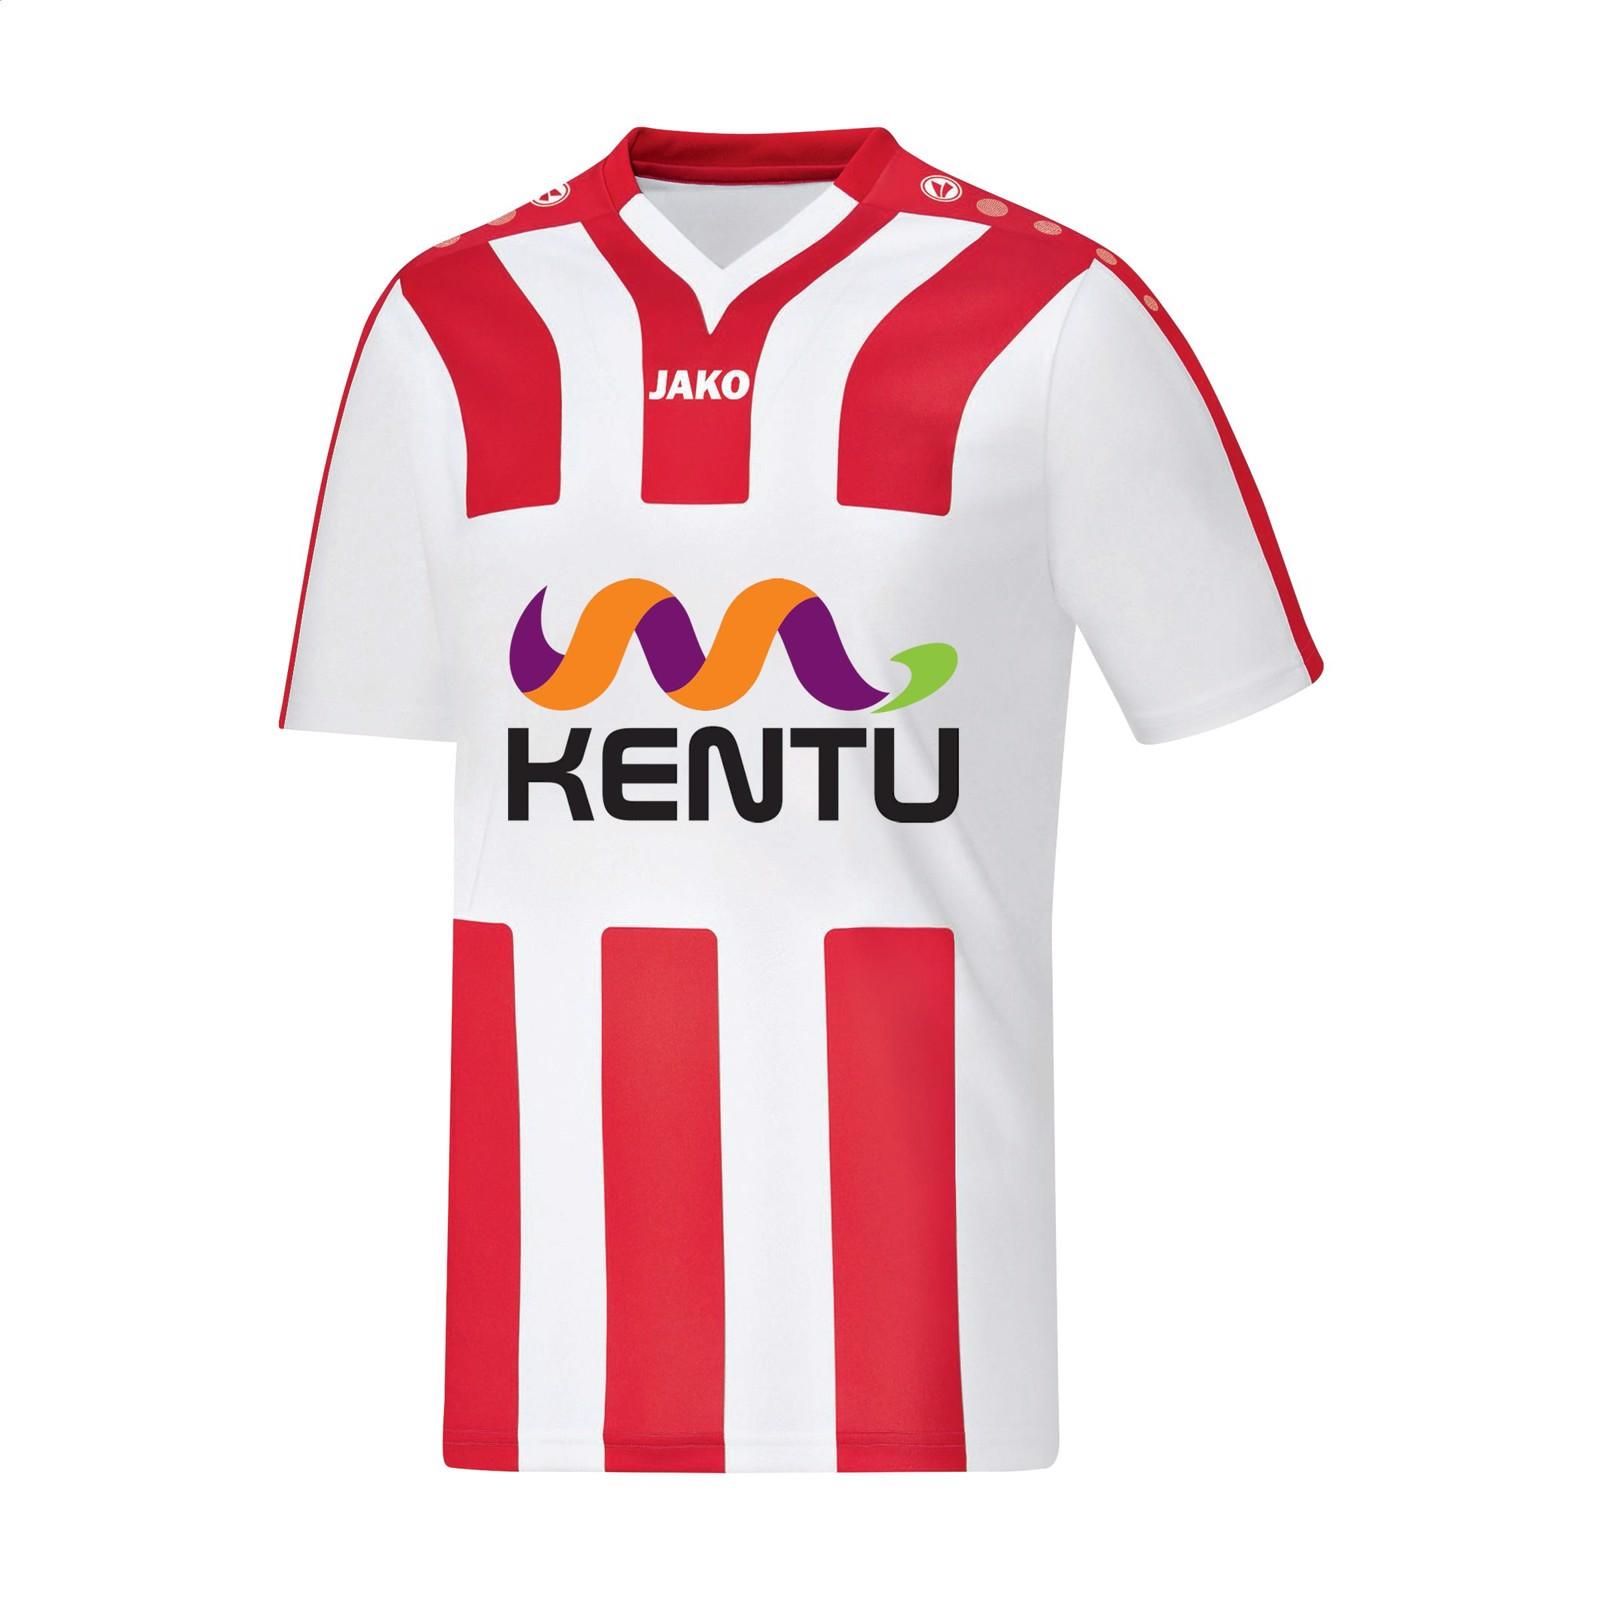 Jako® Shirt Santos KM mens sportshirt - White / Red / S